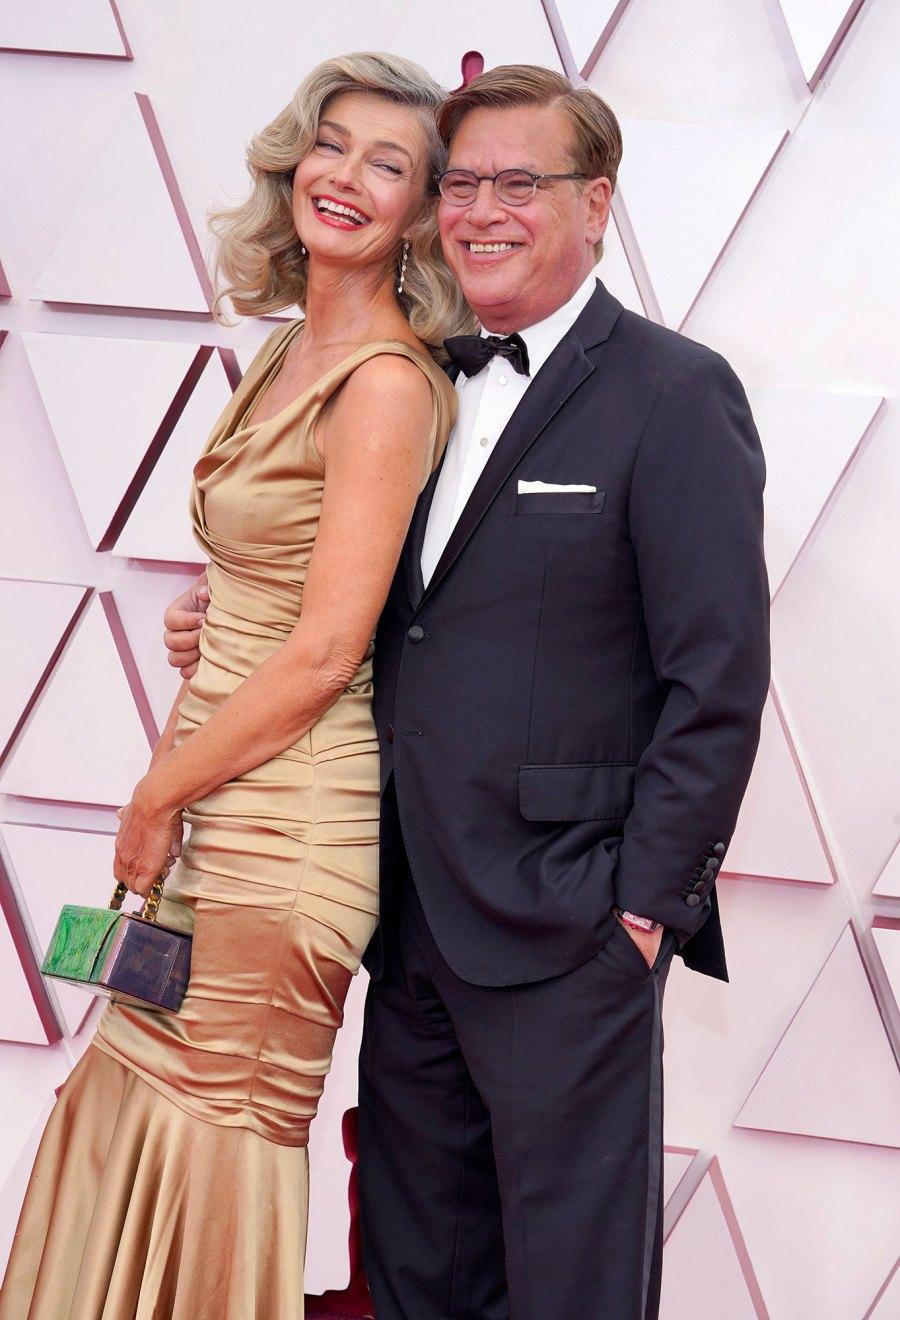 Paulina Porizkova and Aaron Sorkin Couples Dazzle at Oscars 2021